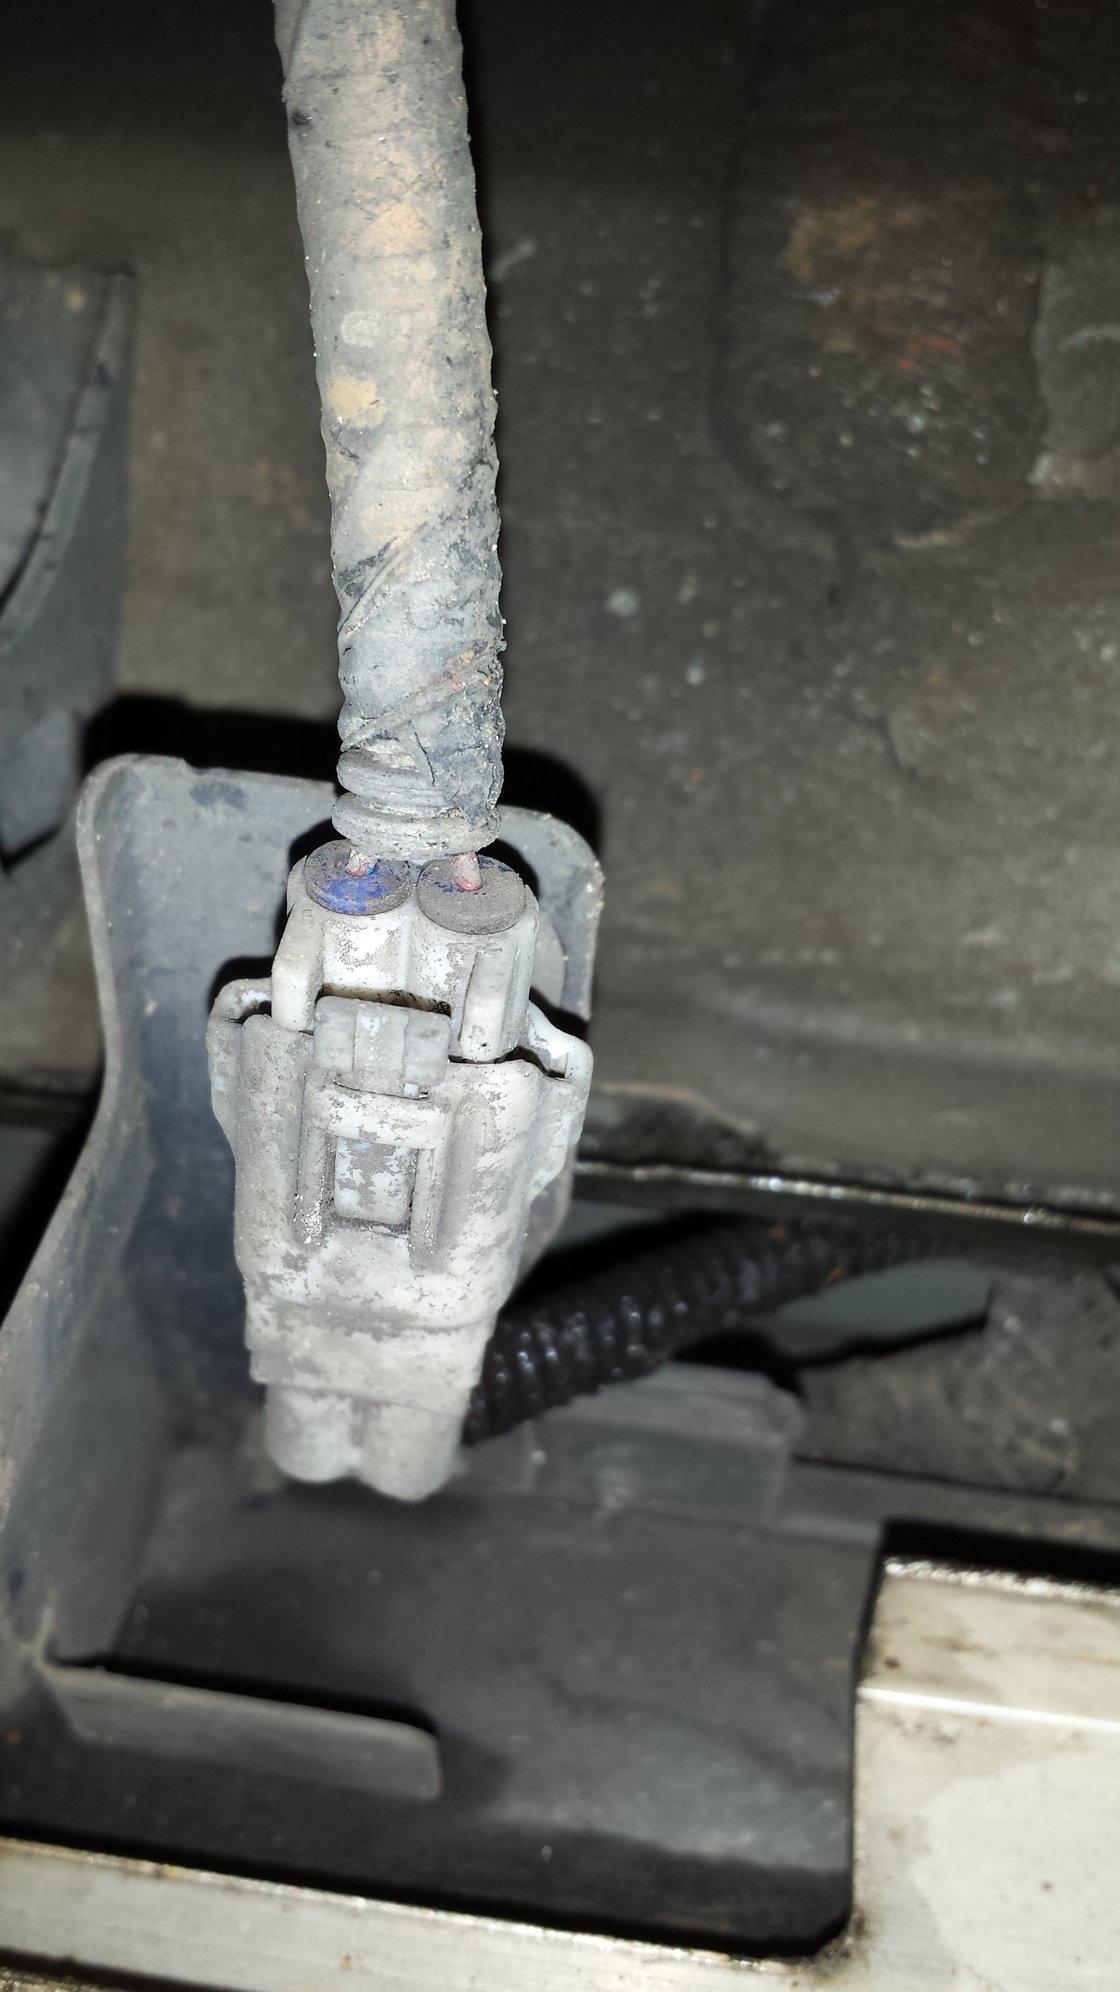 Surprising Diy Running Board Removal With Pics Clublexus Lexus Forum Wiring 101 Ivorowellnesstrialsorg